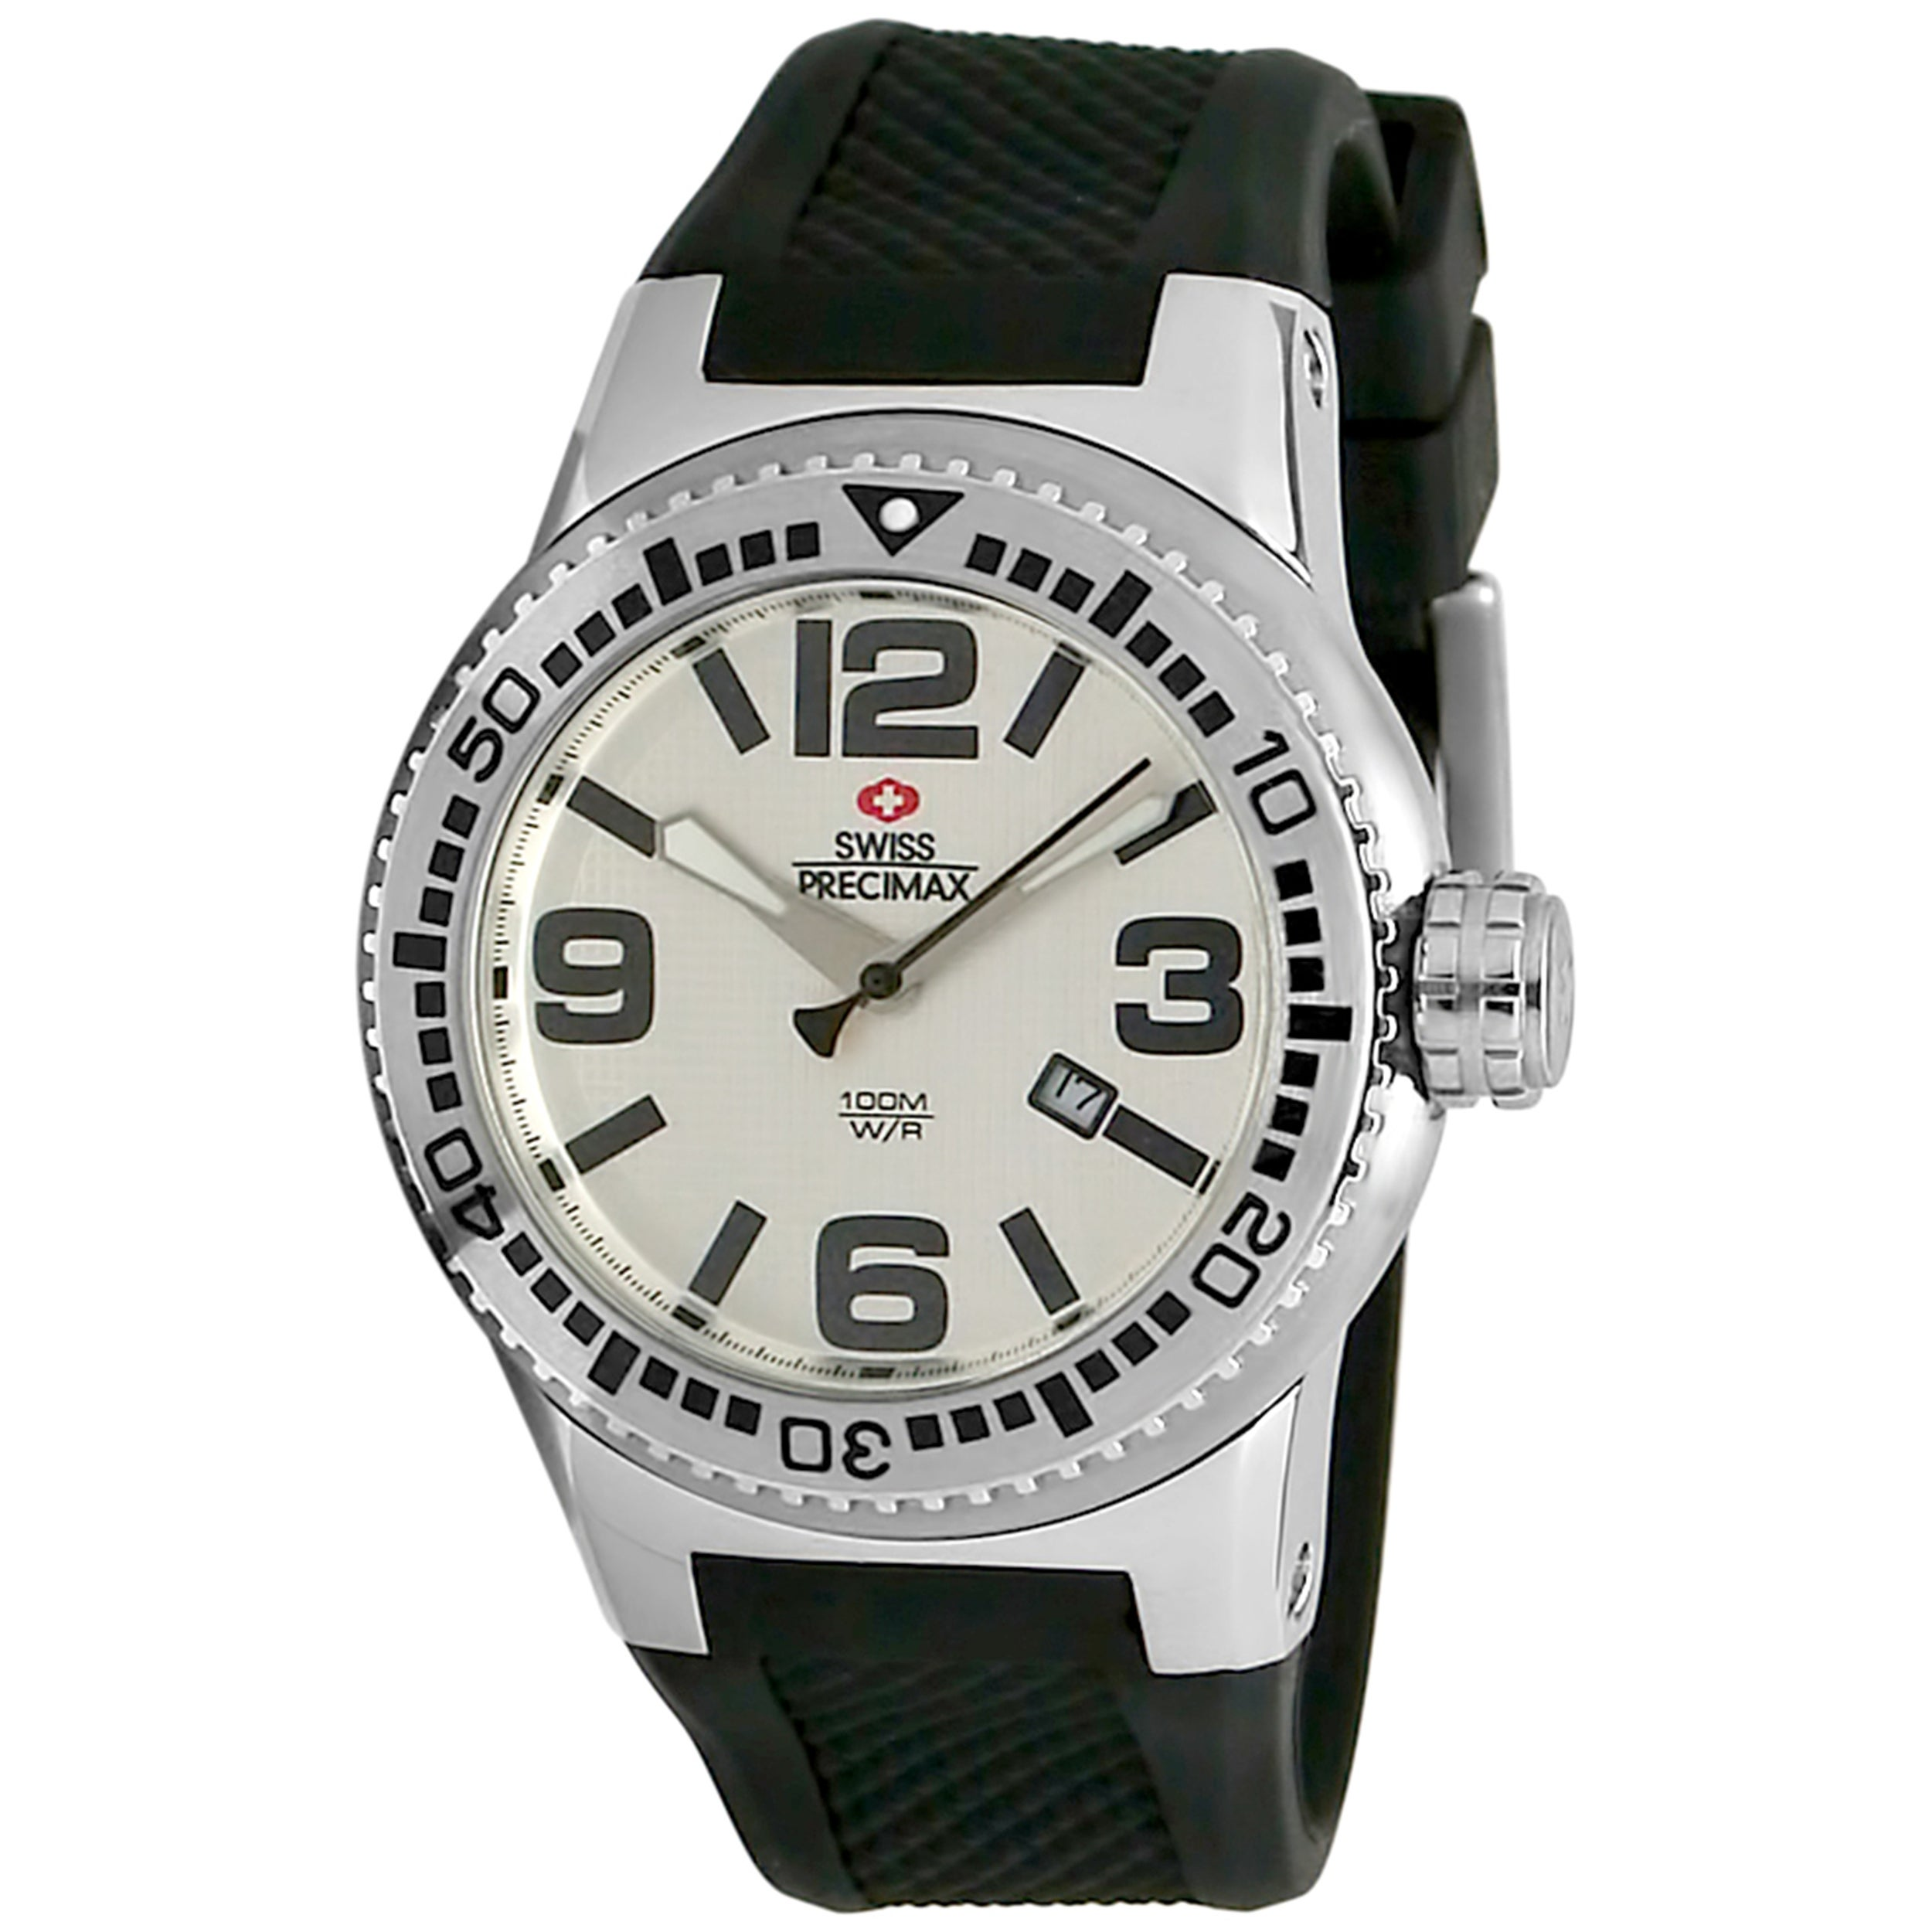 Swiss Precimax Men's Titan Silicone Water-Resistant Watch